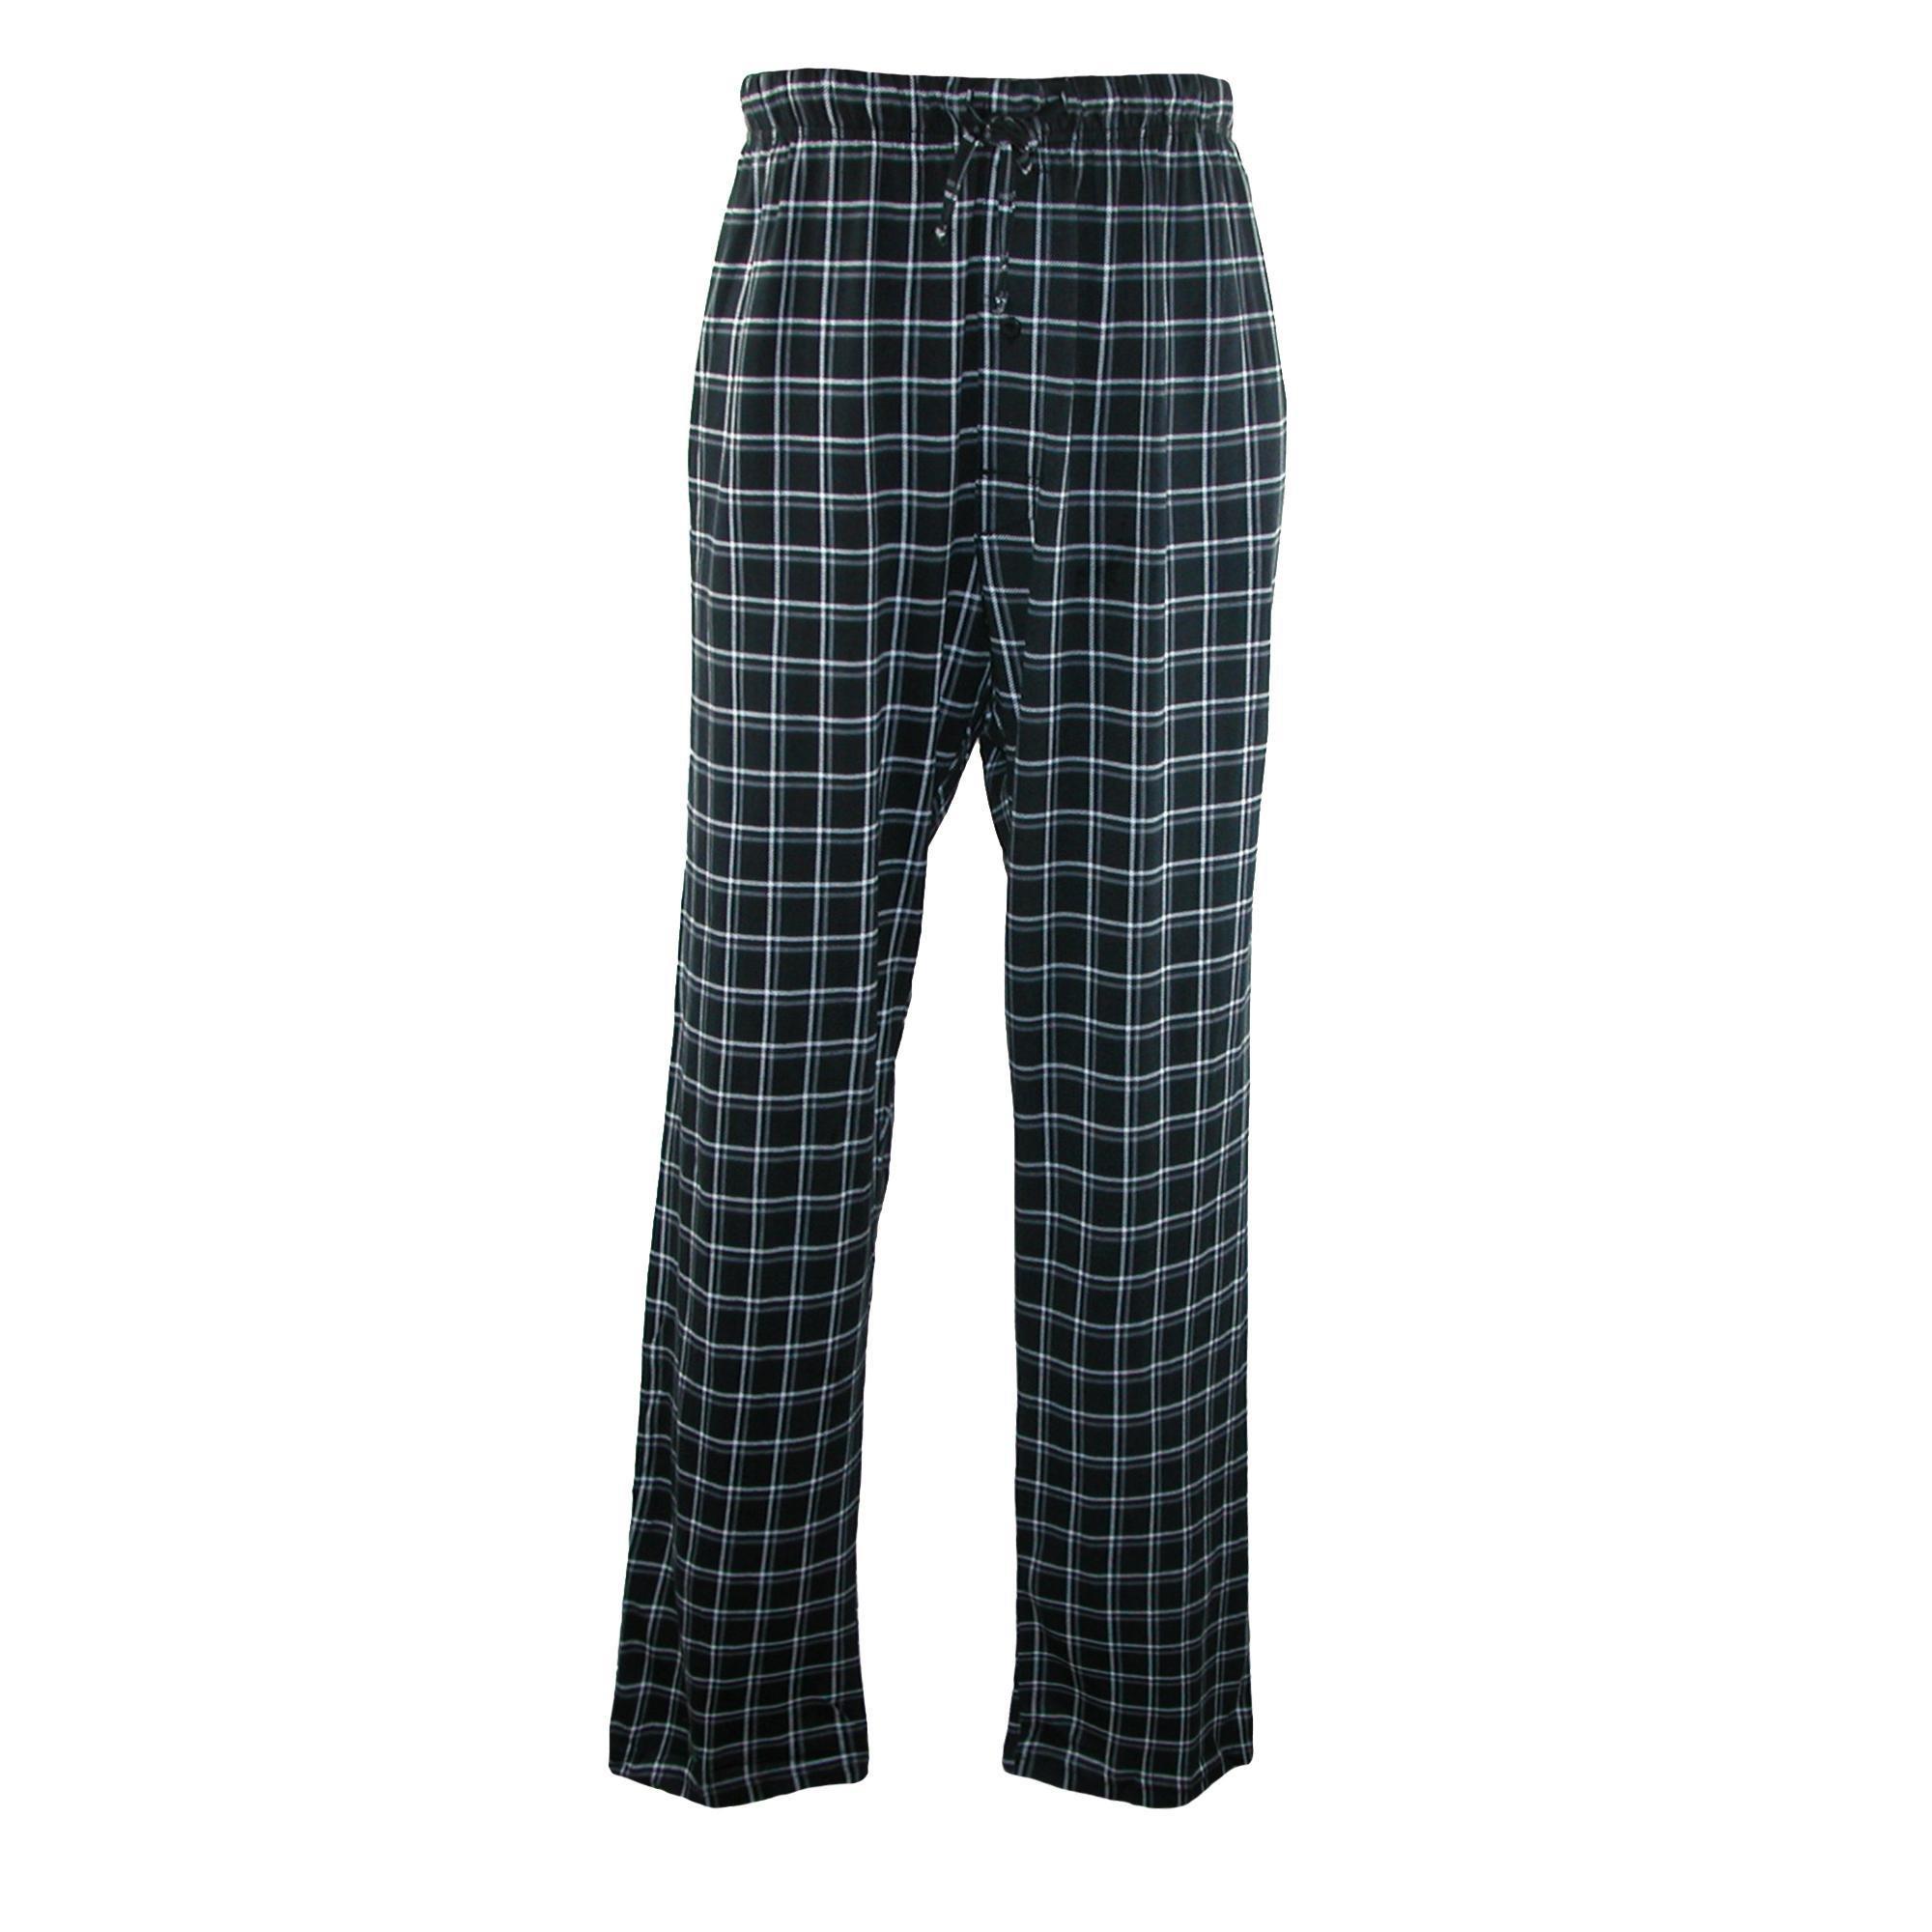 Hanes Men's Cotton ComfortSoft Printed Knit Pants, Large, Midnight